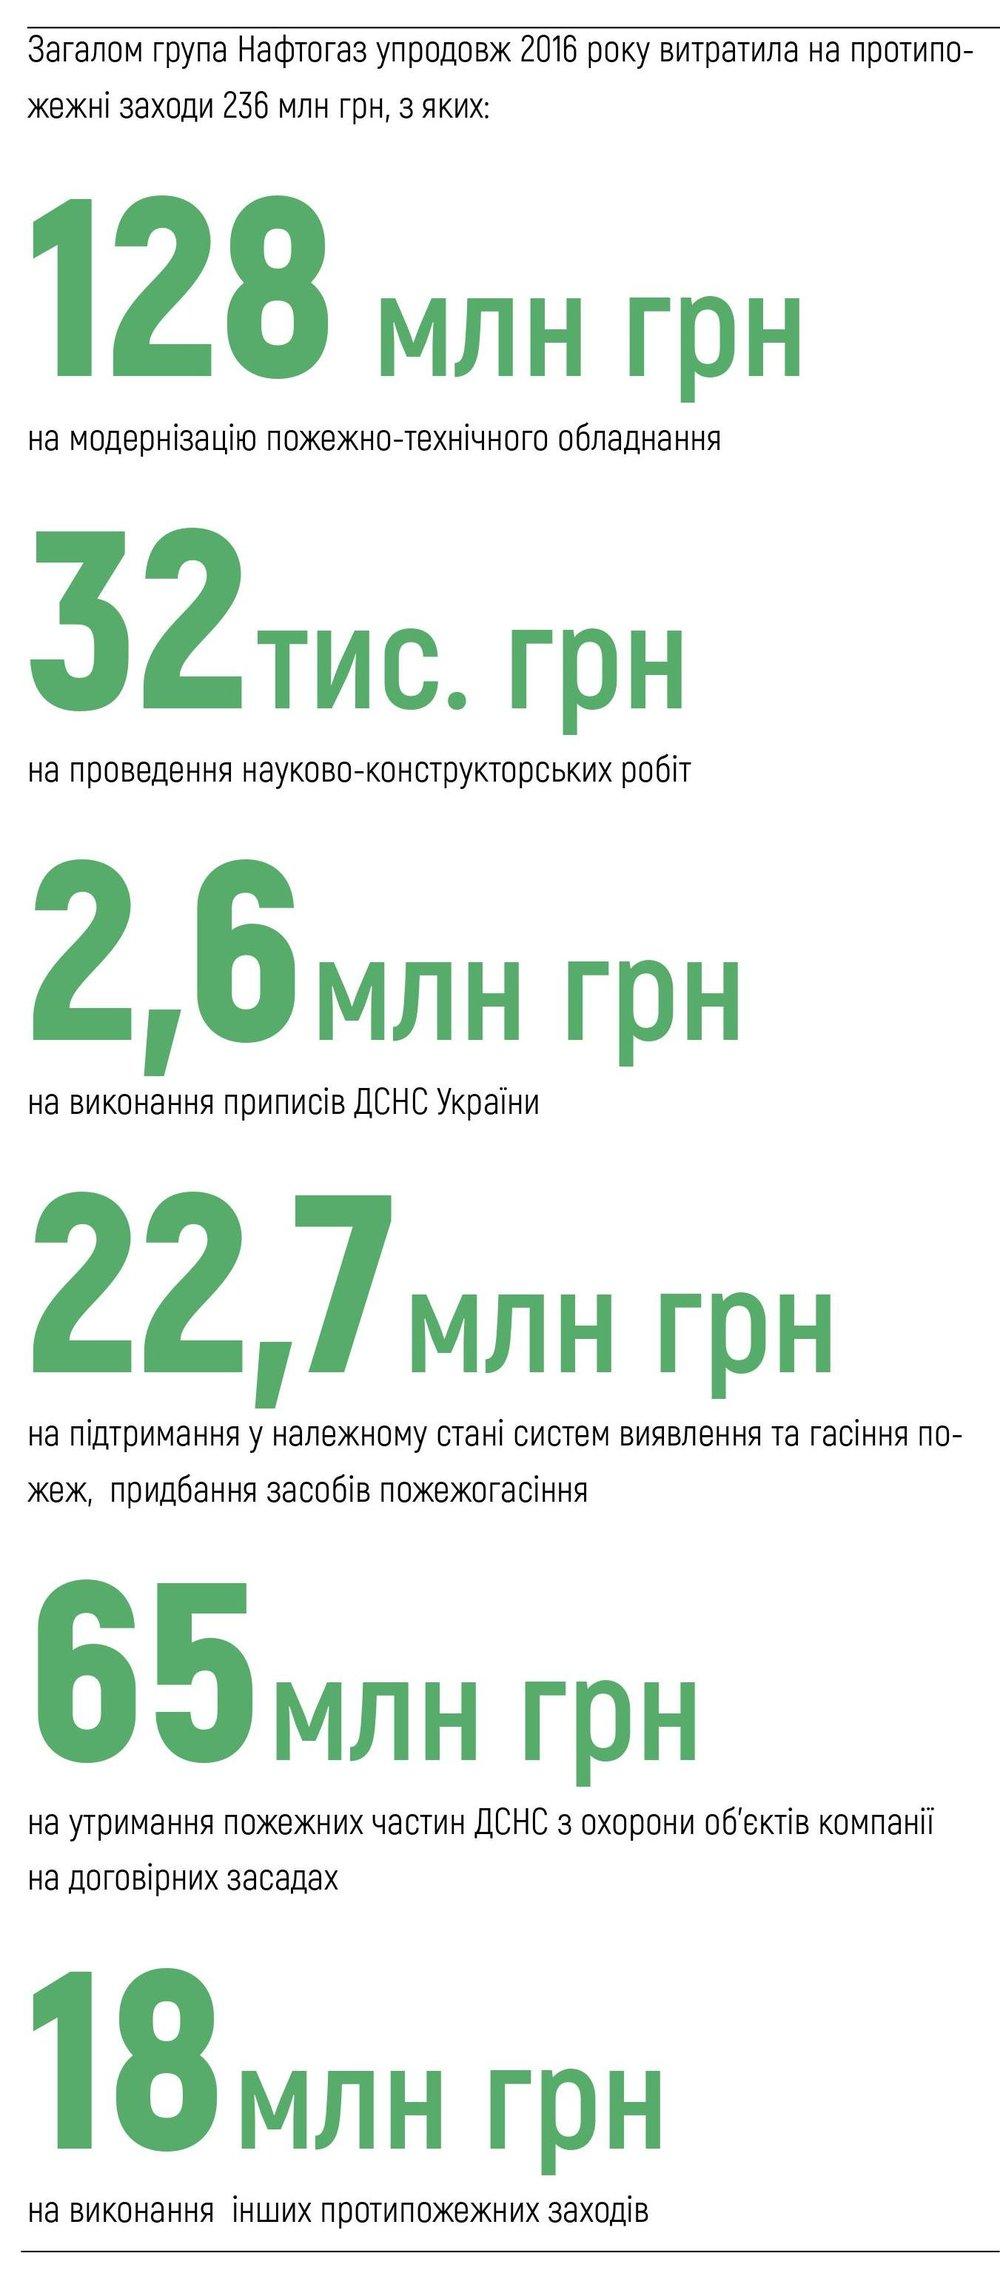 Загалом група Нафтогаз упродовж 2016 року витратила